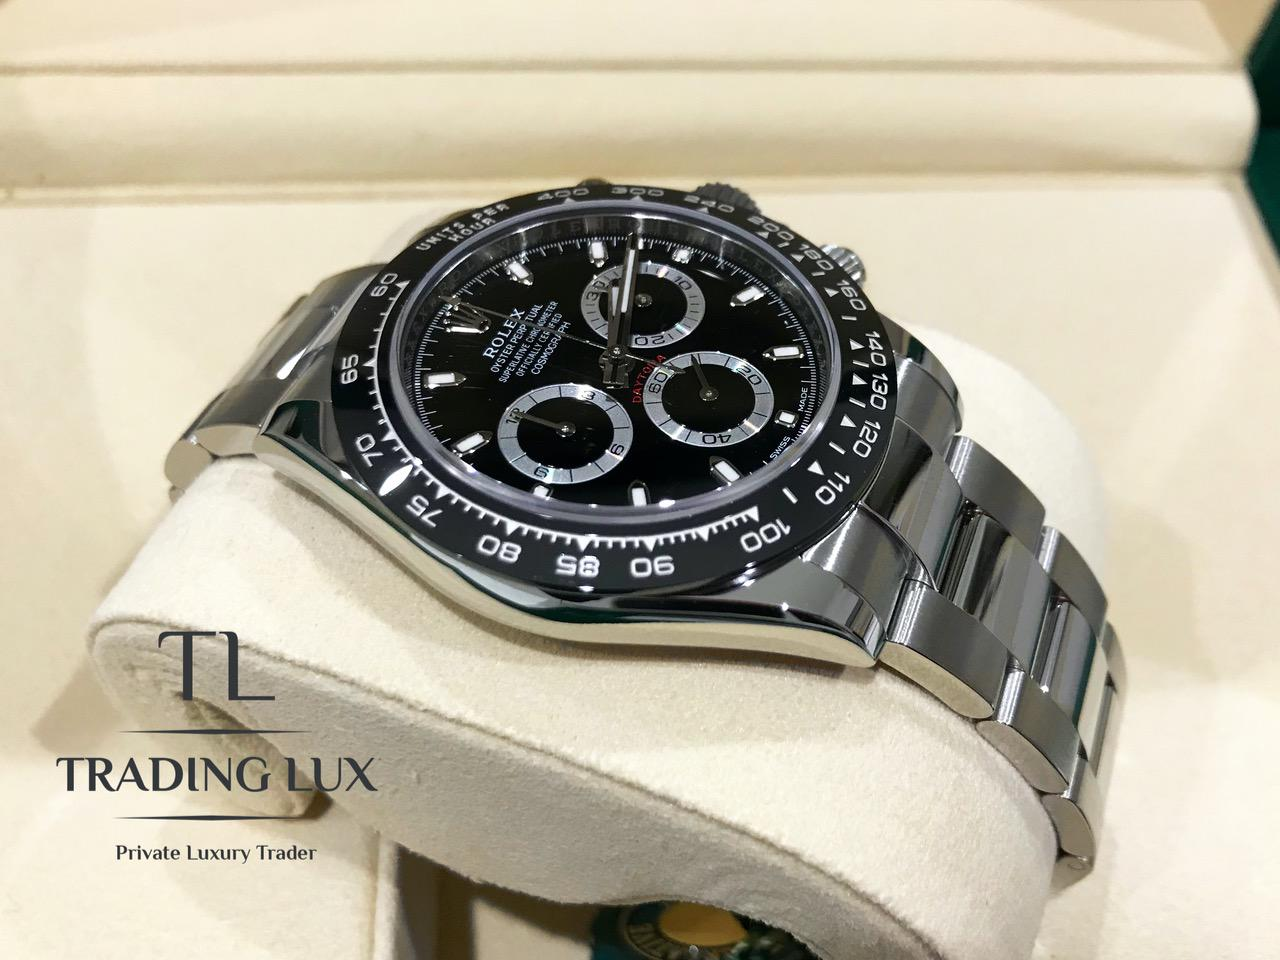 Rolex-Daytona-116500LN-Black-11